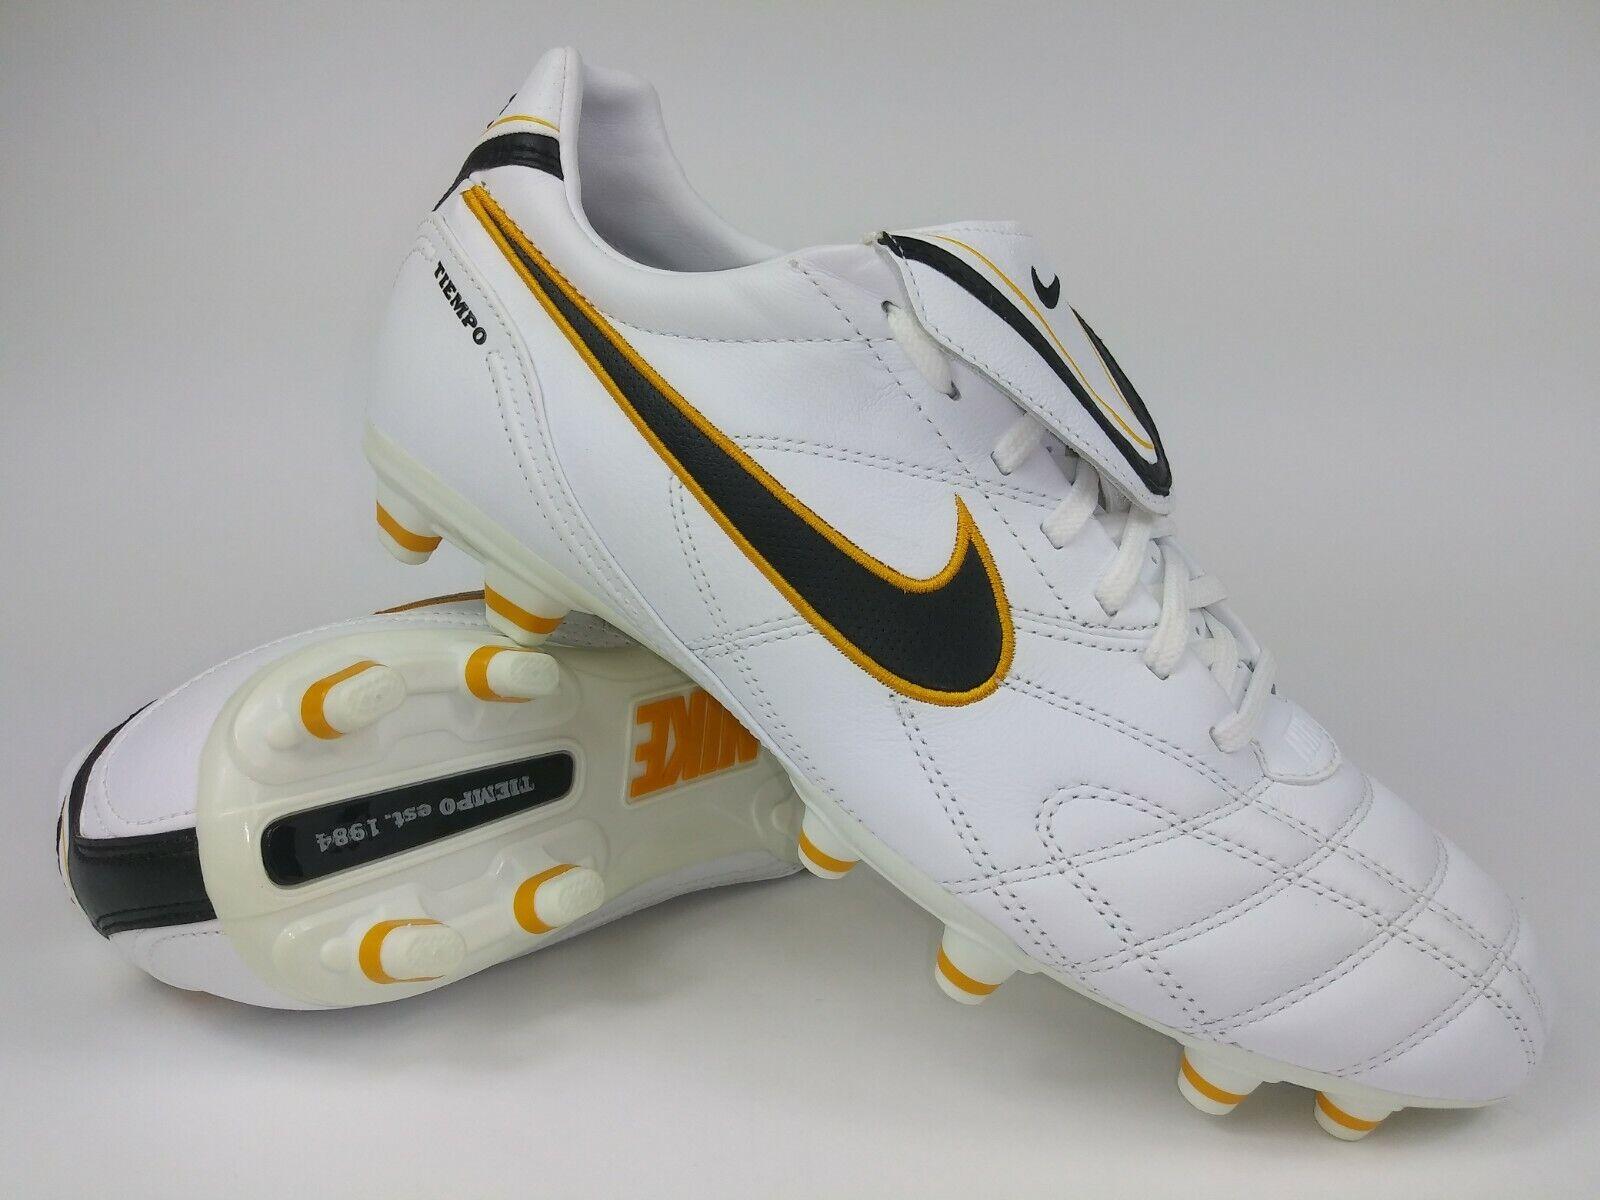 Nike Hombre Raro Tiempo Mystic Lll FG 366180-108 blancooo Amarillo Botines de hombre talla 6.5